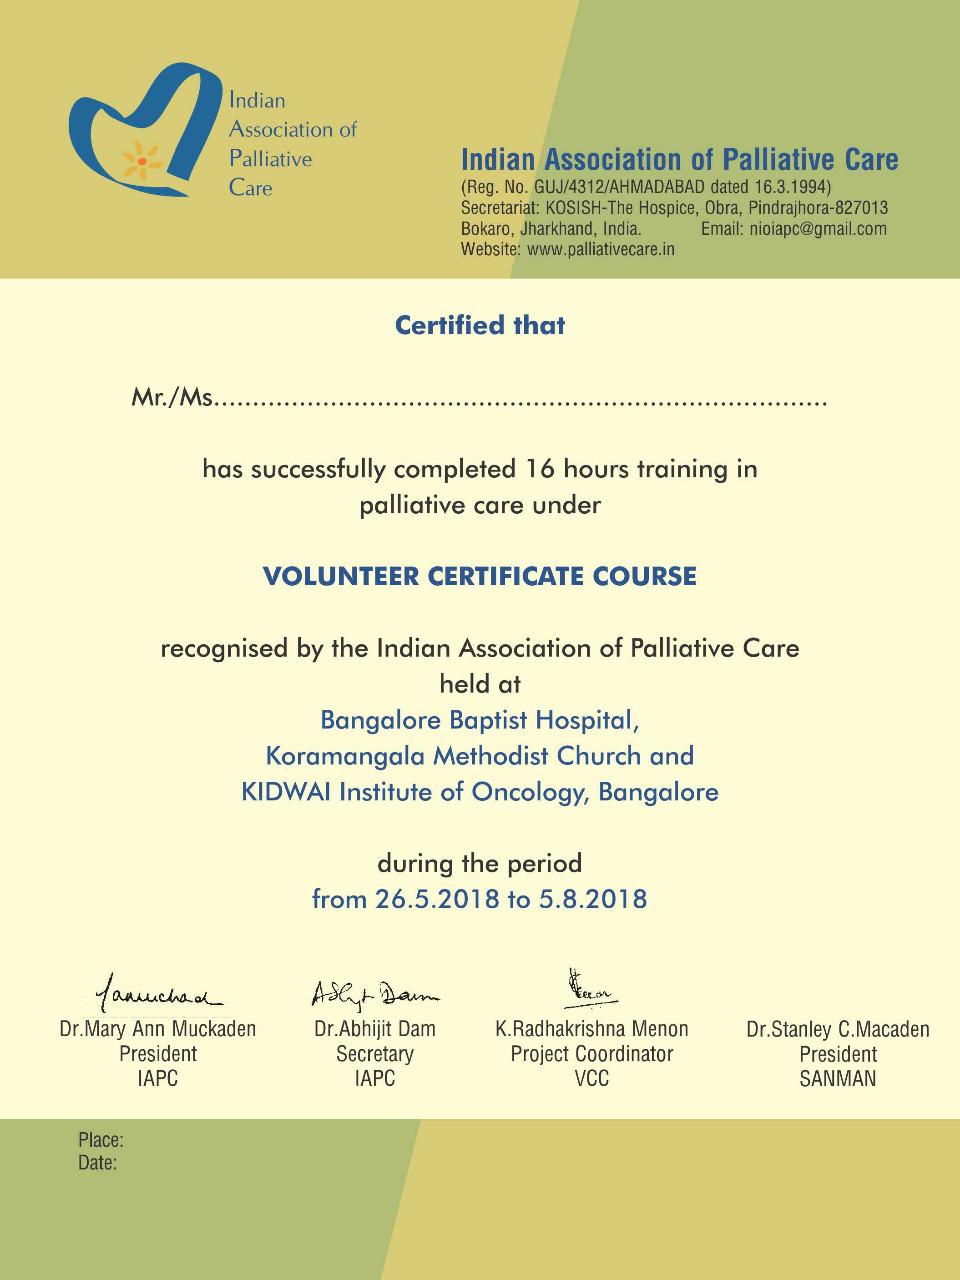 Indian Association Of Palliative Care Volunteers Training In